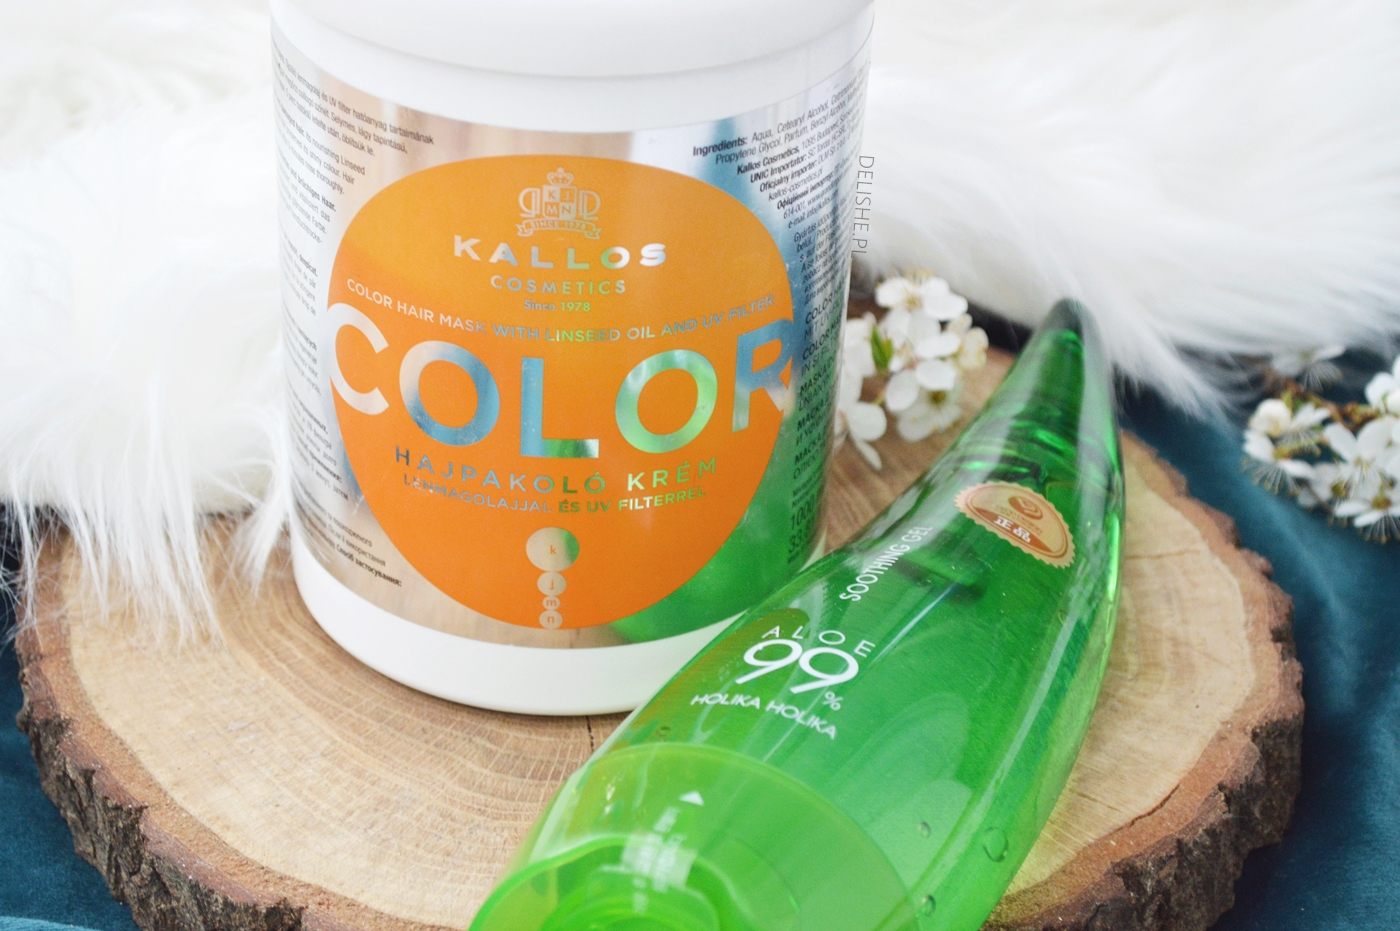 maska do emulgowania oleju kallos color i żel aloesowy